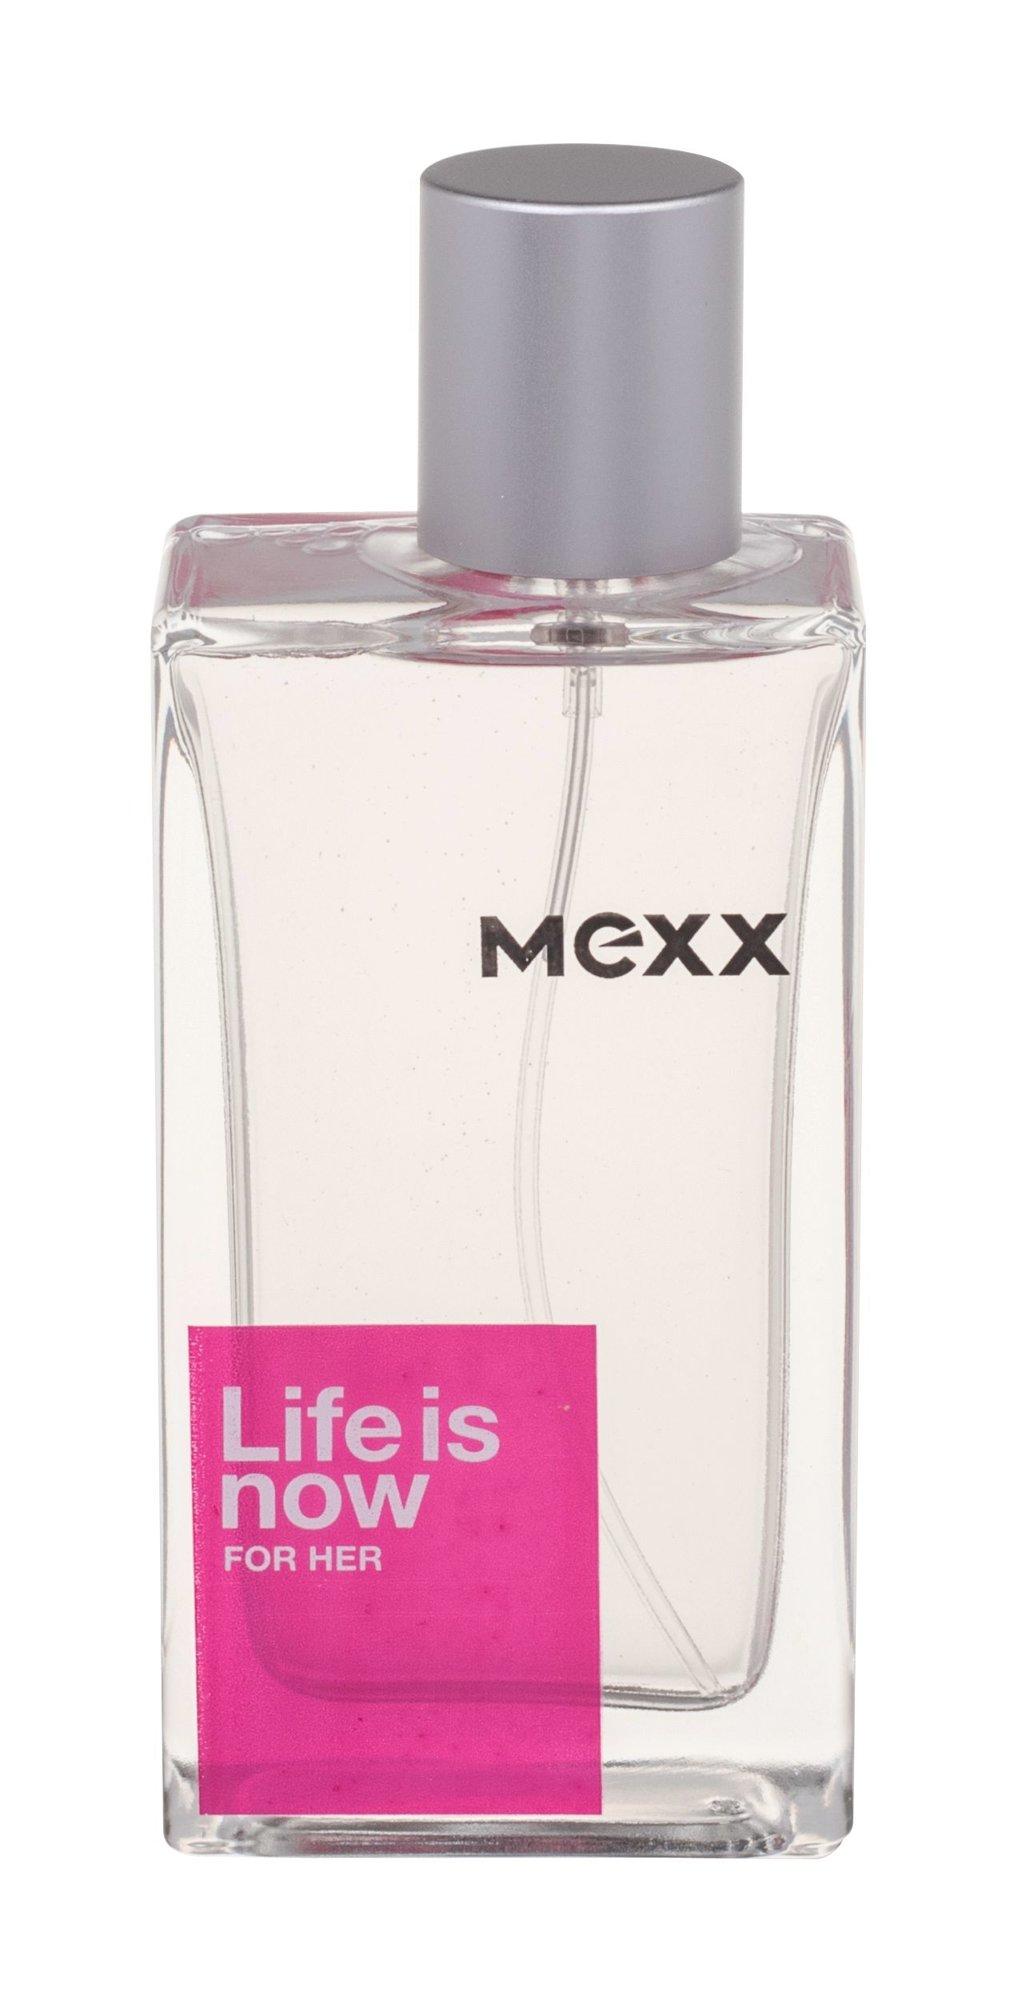 Mexx Life is Now EDT 50ml